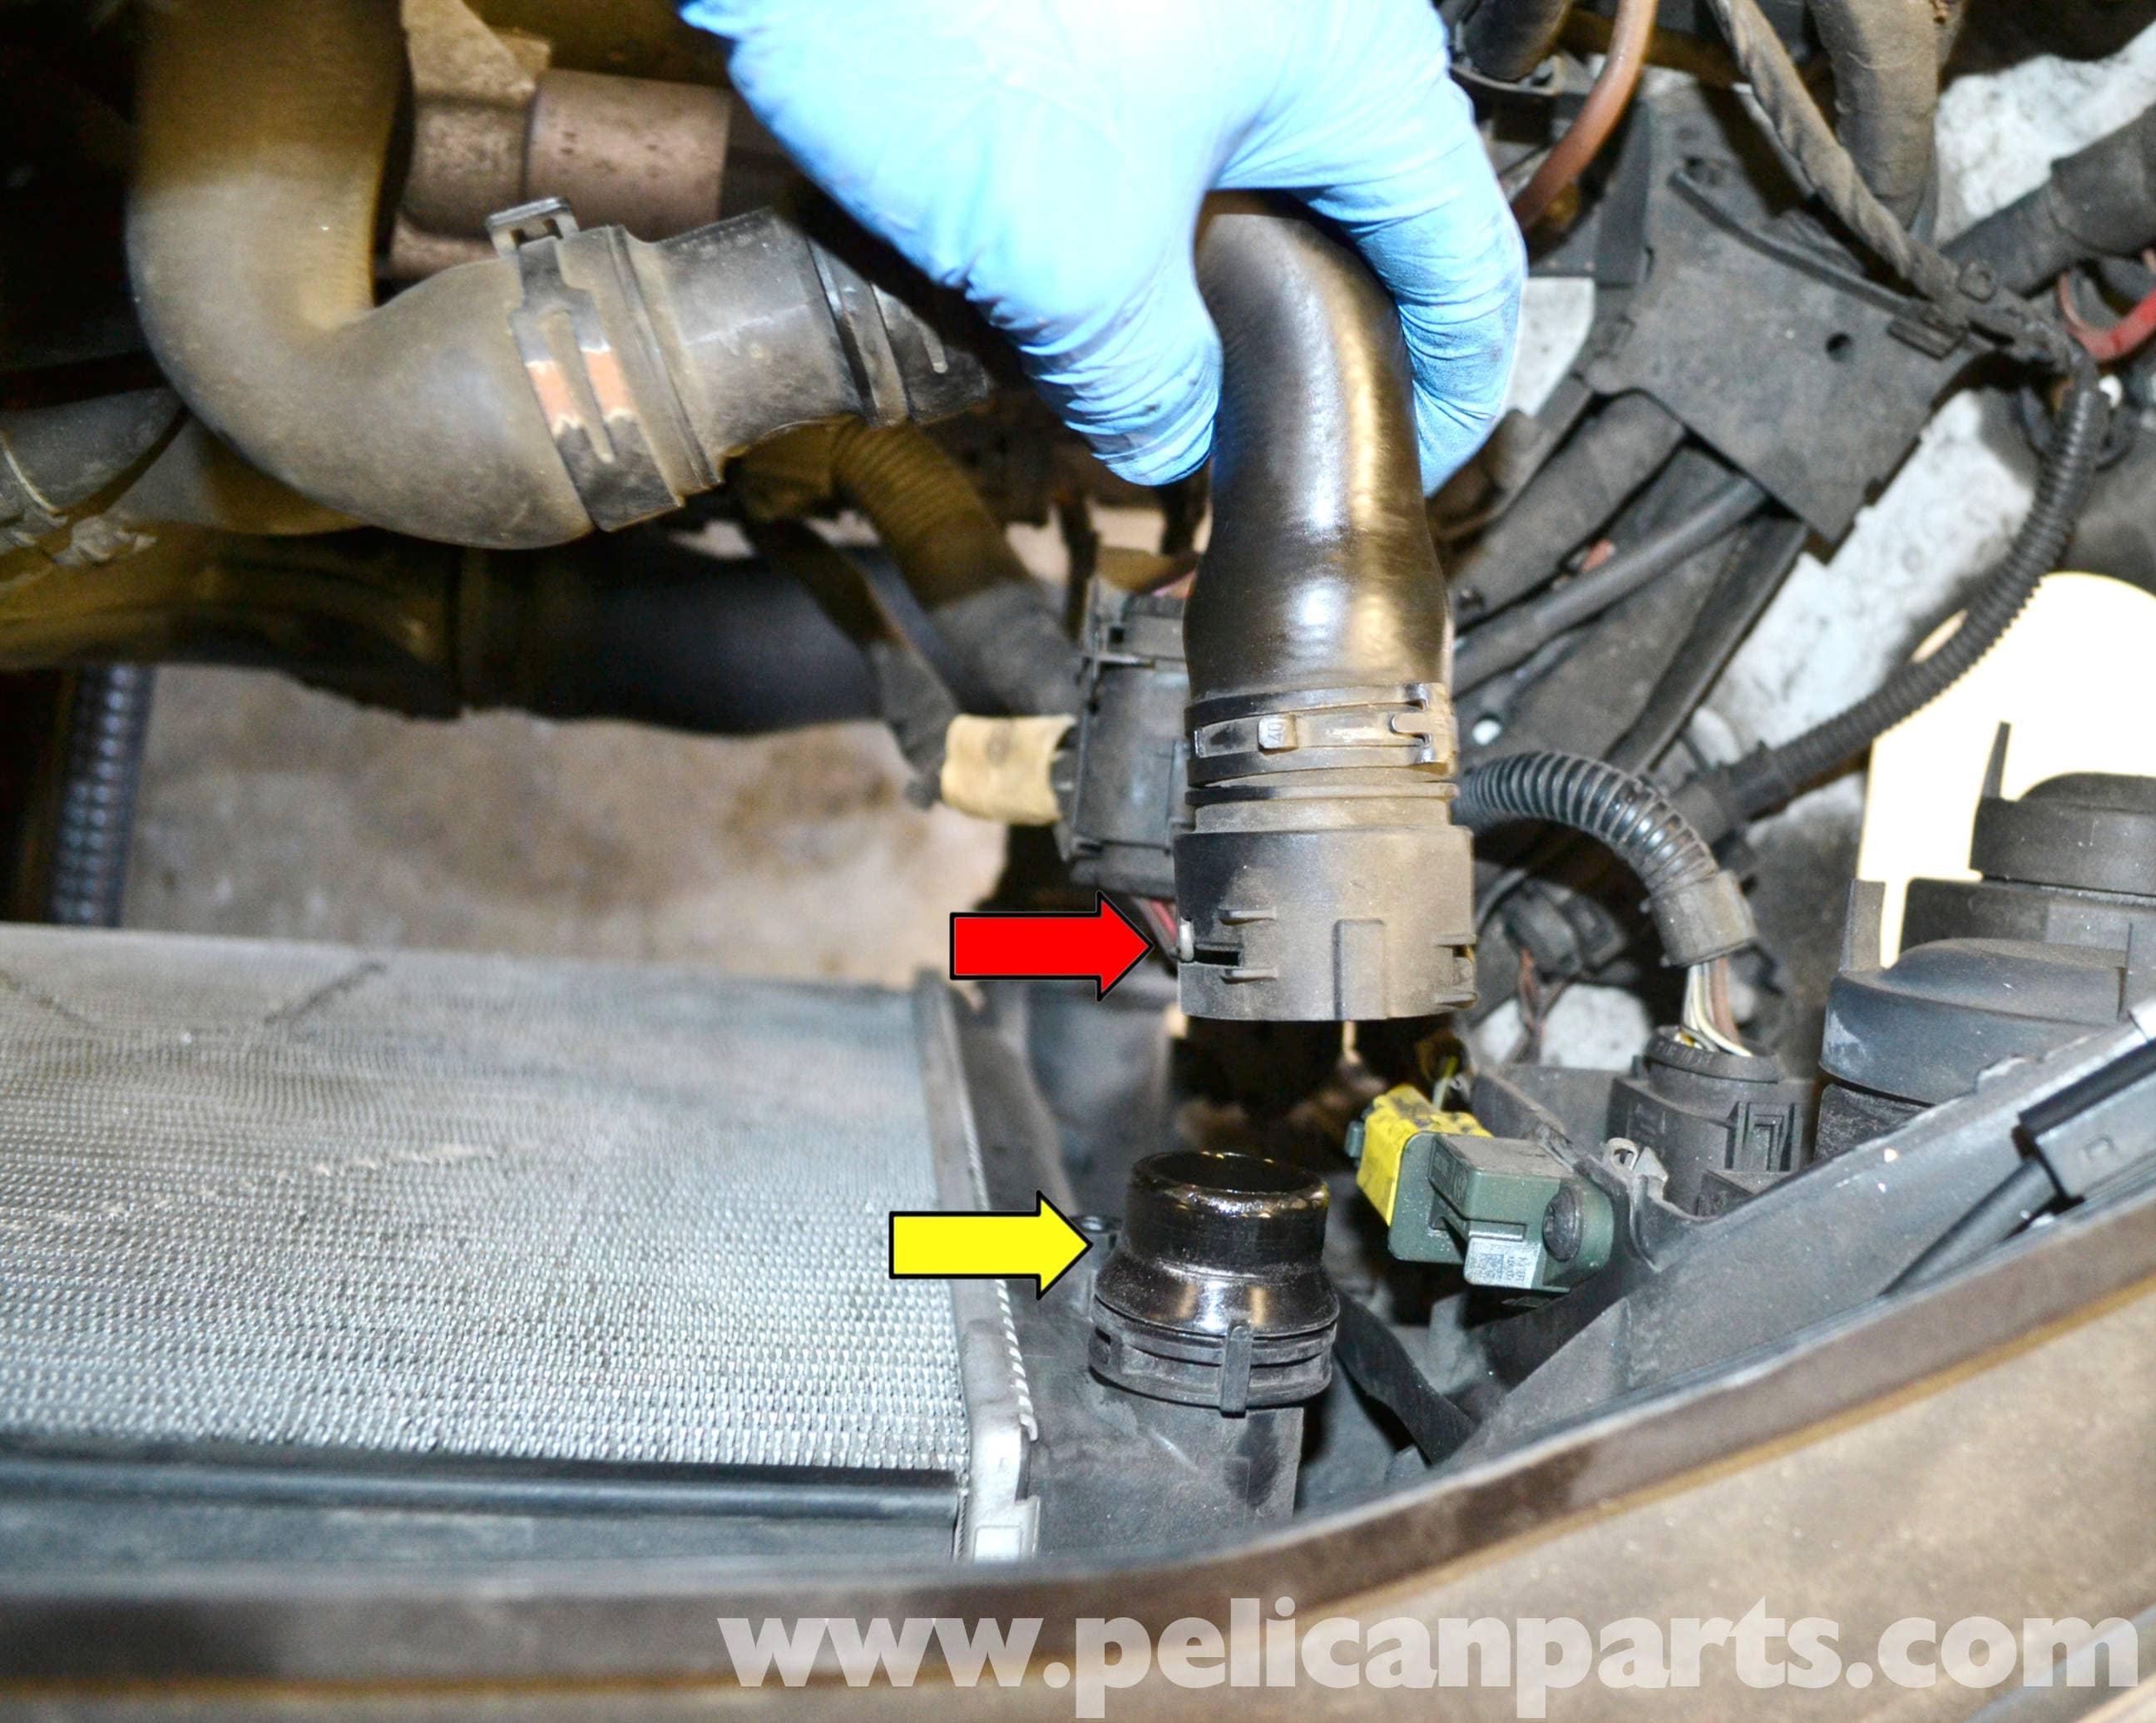 2008 Tahoe Fuel Filter Location Volkswagen Golf Gti Mk V Radiator And Coolant Hose